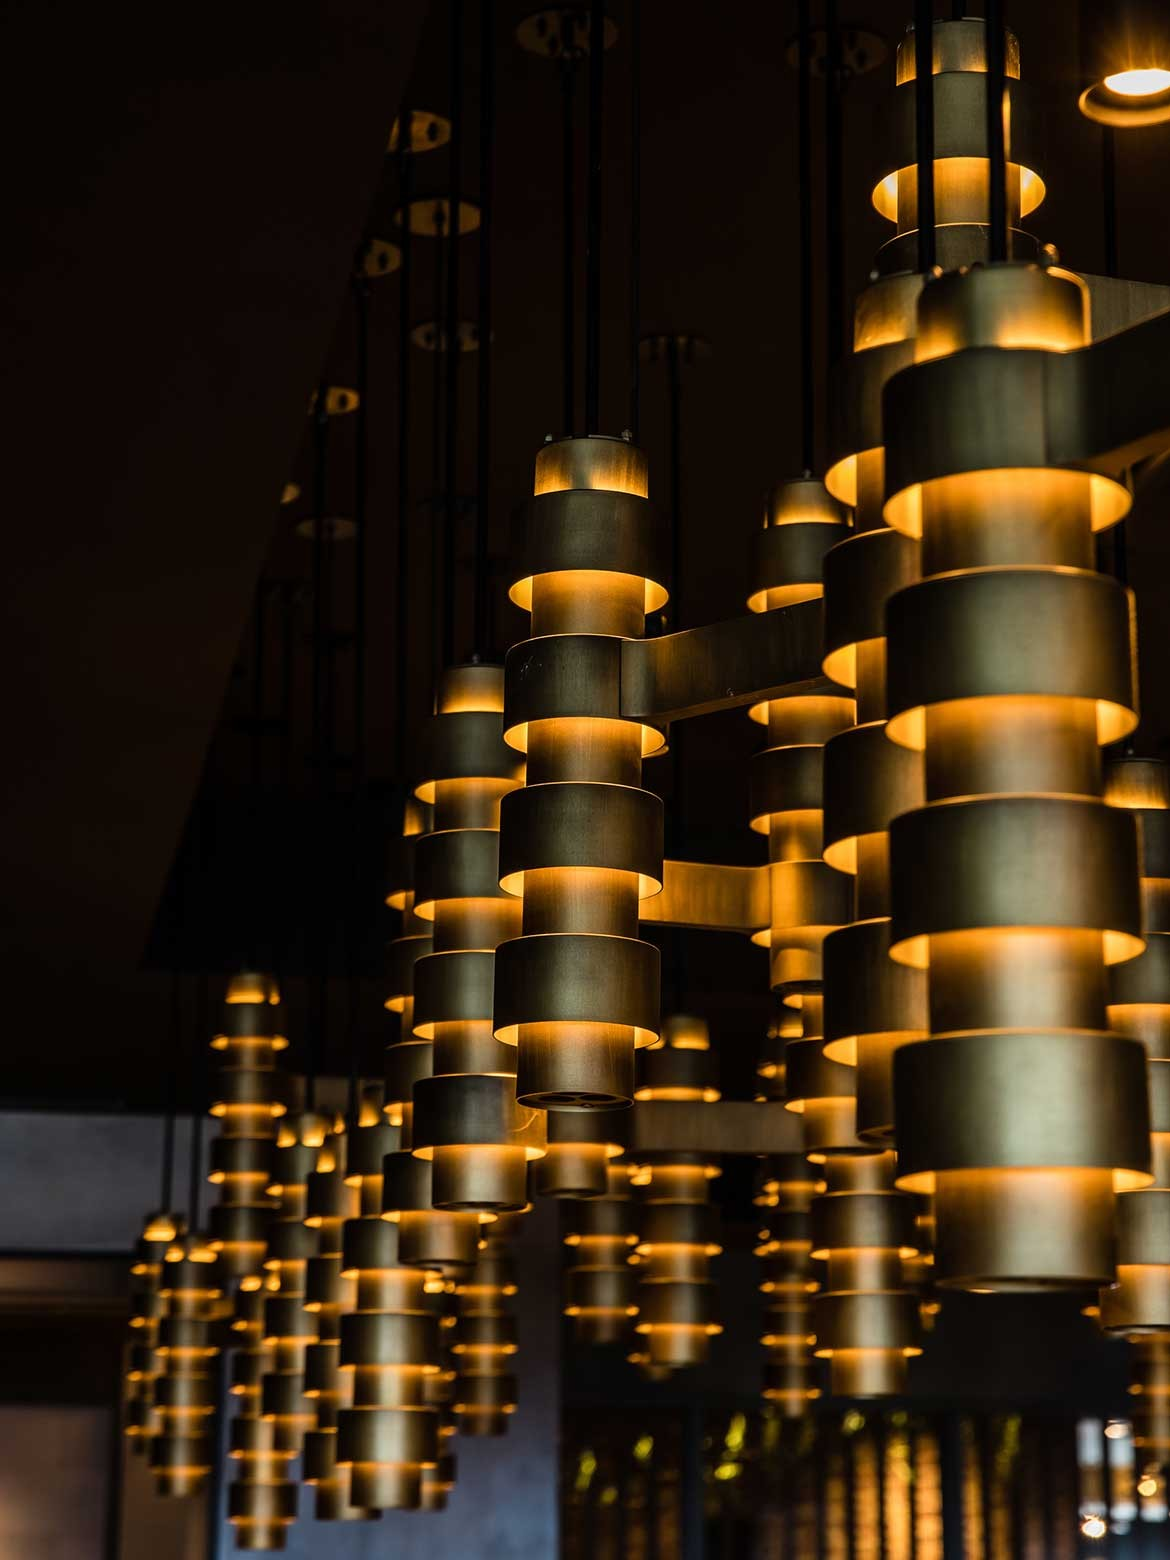 Luchetti Krelle Longrain Tokyo lights